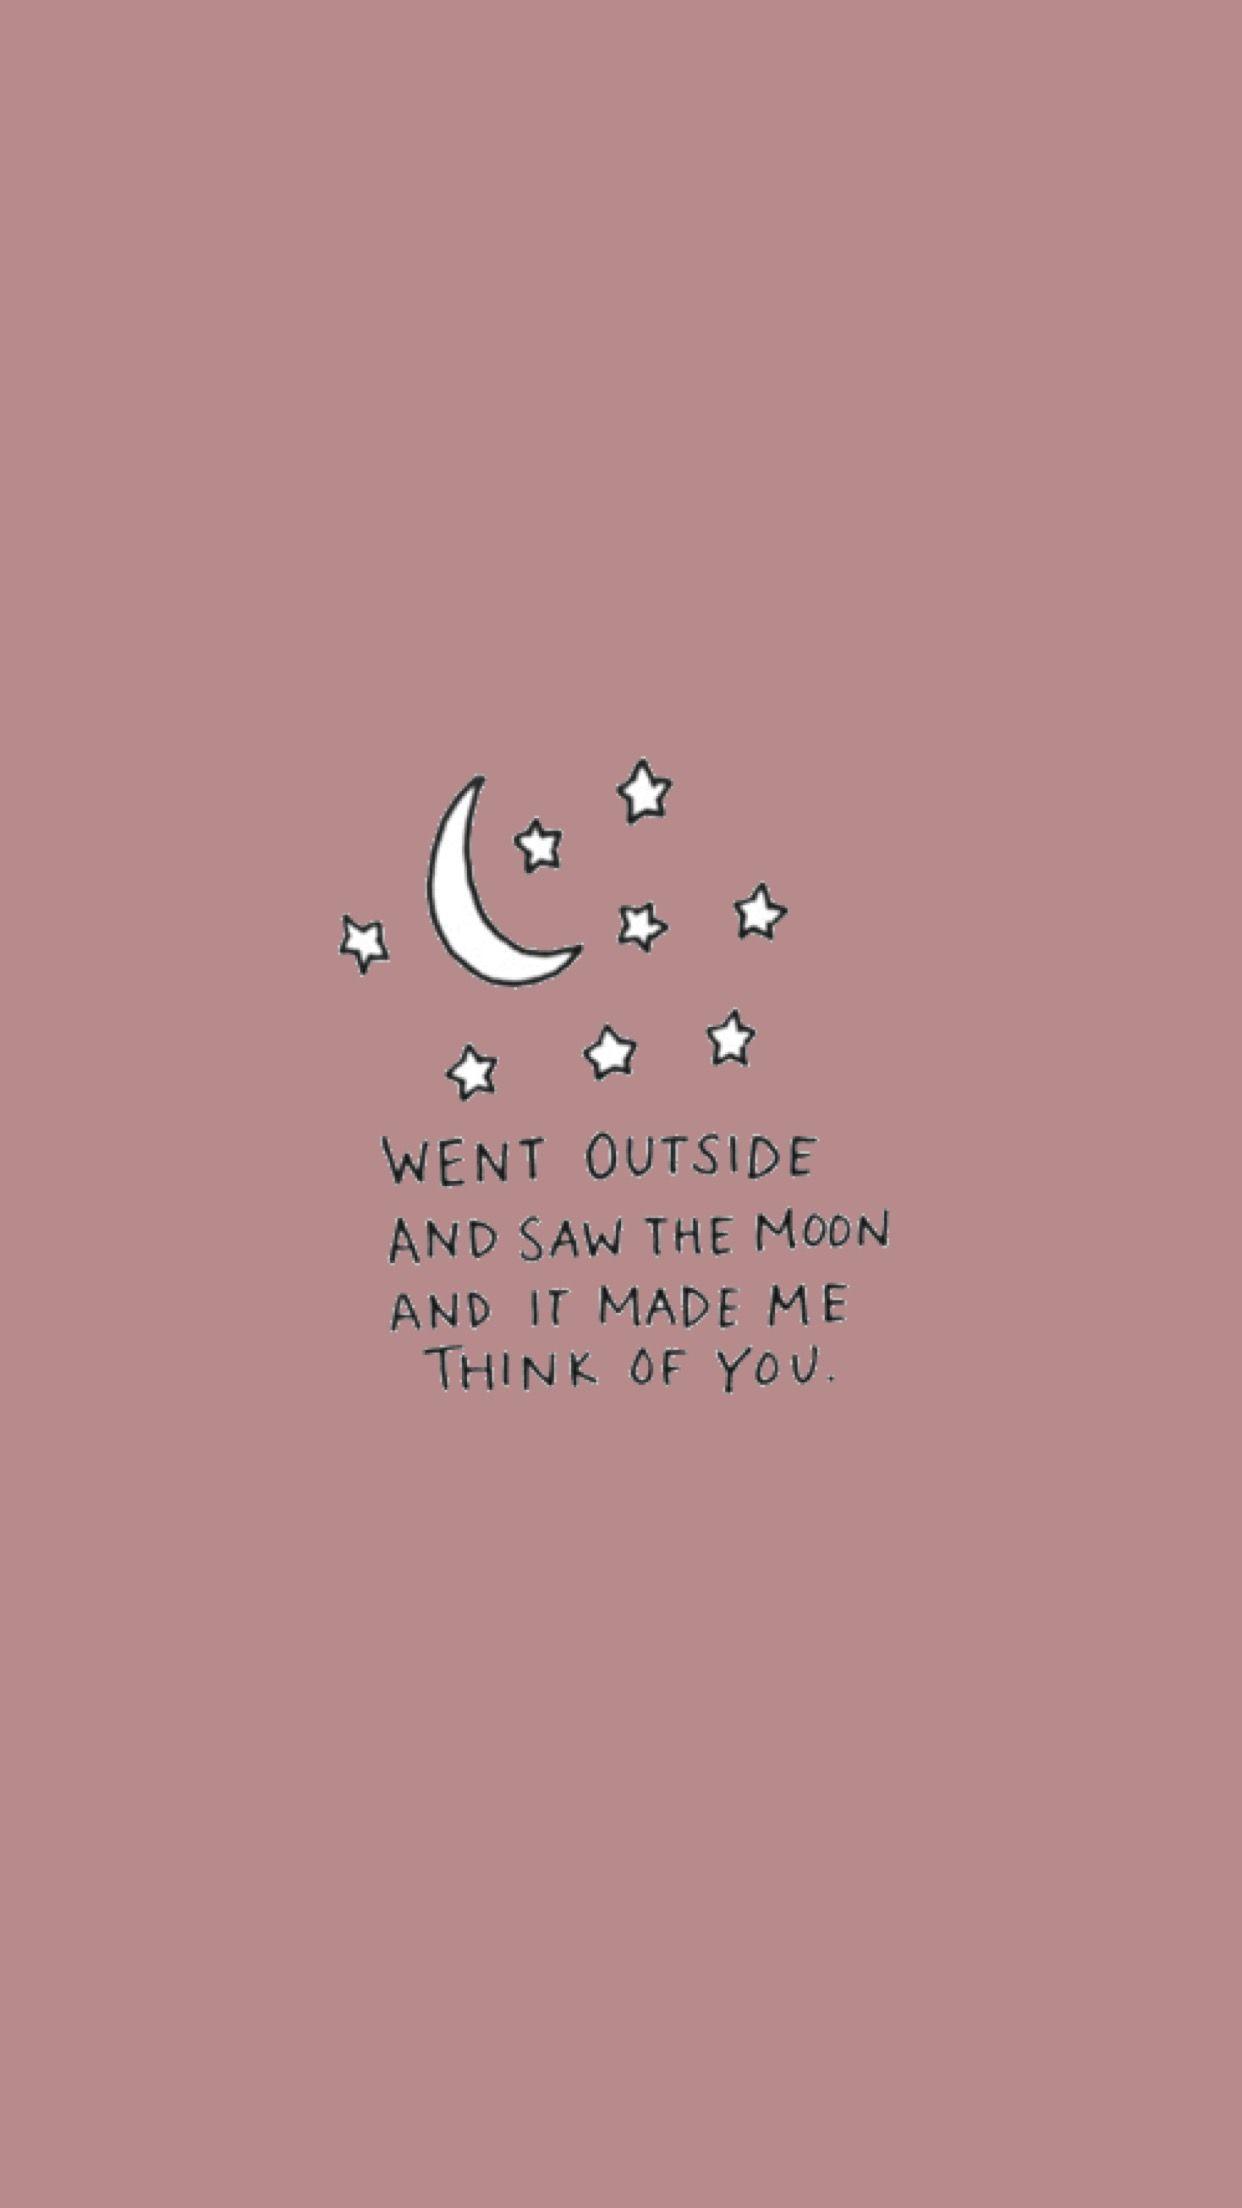 You-Moon wallpaper | made by Laurette | instagram:@laurette_evonen | Wallpapers | Cute quotes ...